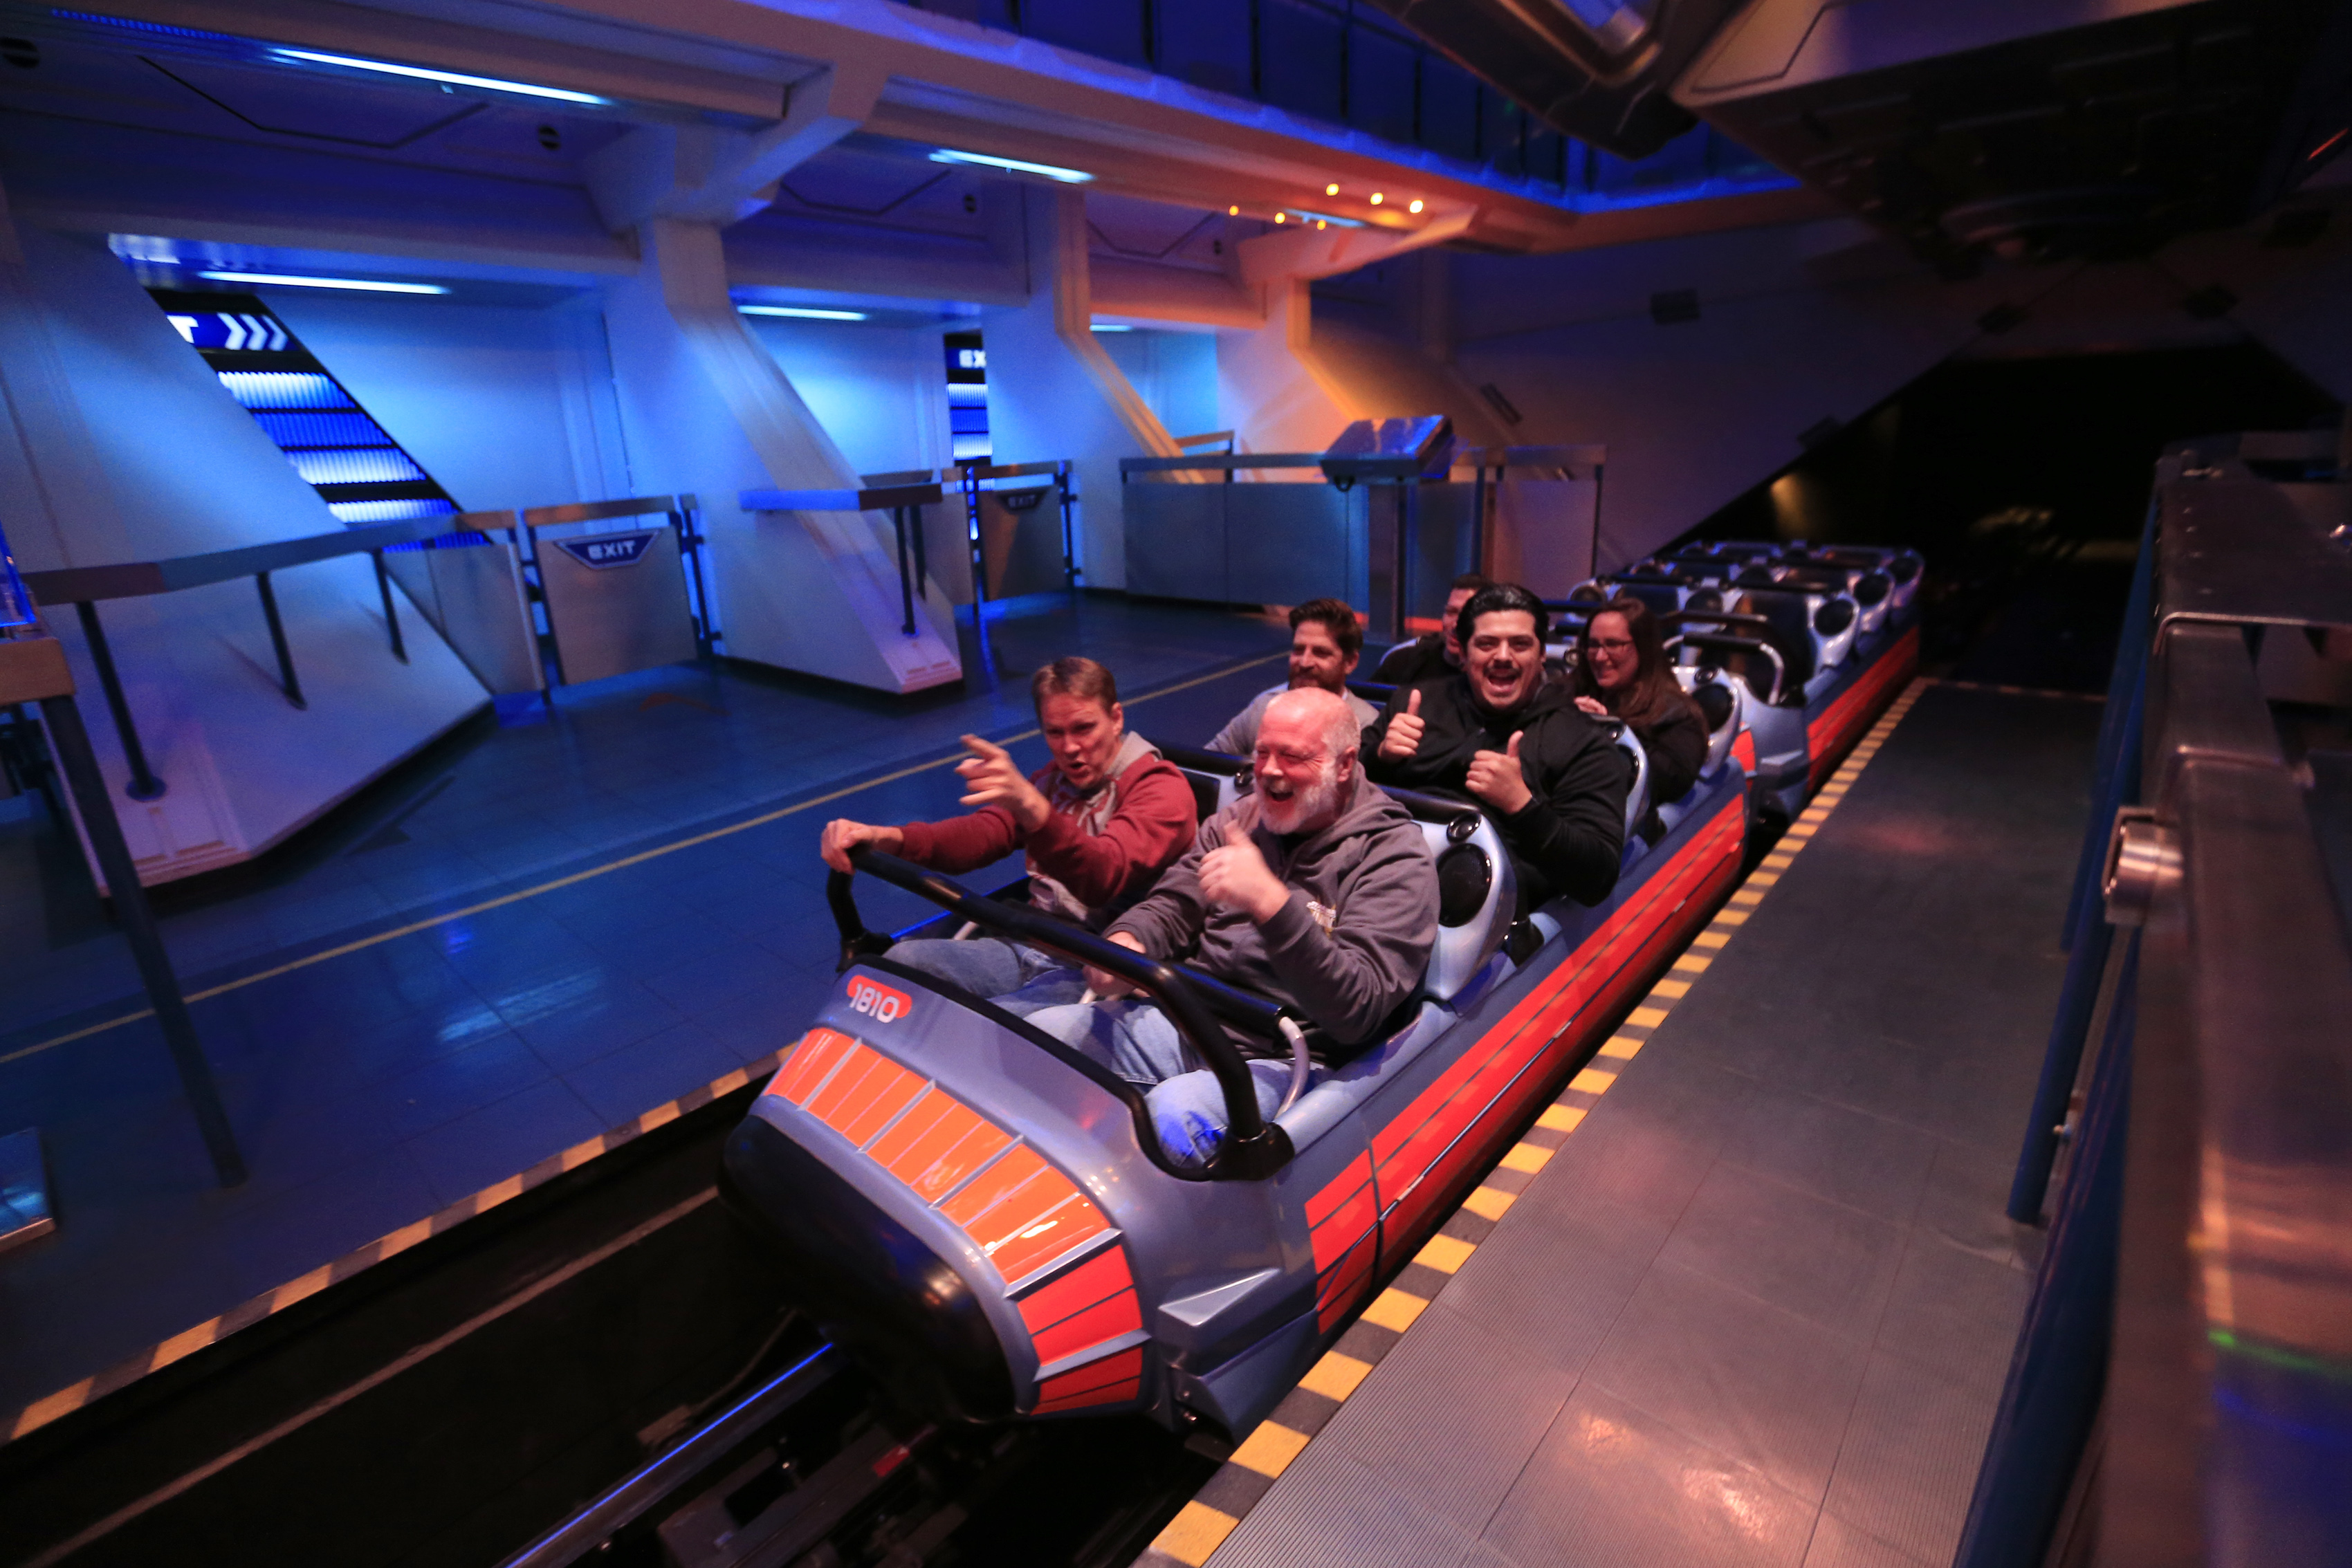 Star Wars Season in Disneyland